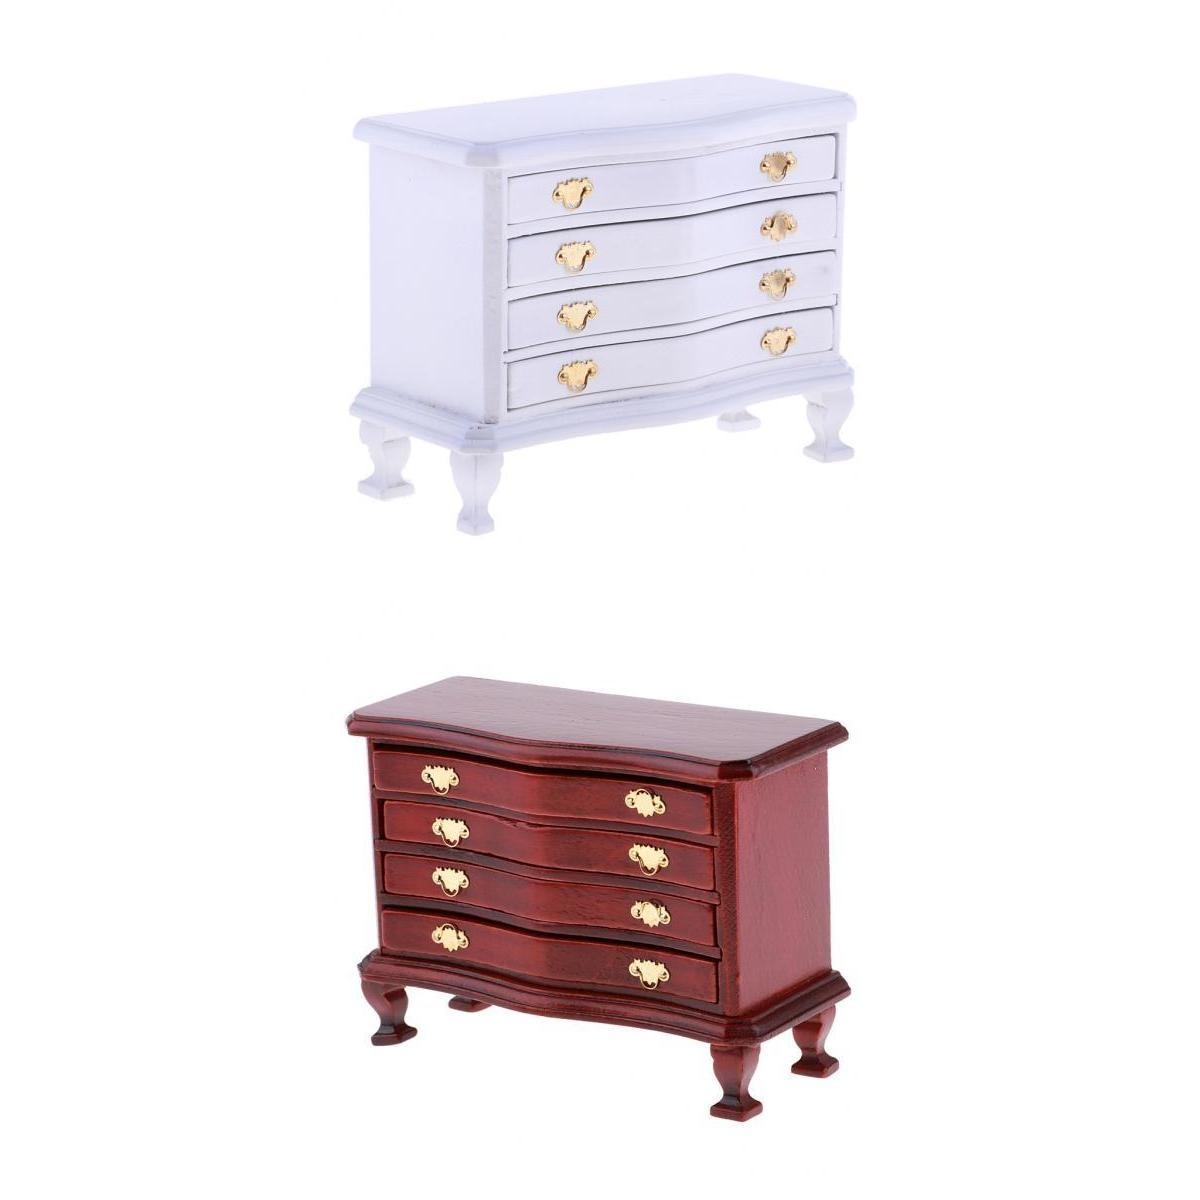 1//12 Miniature Wooden Dresser 4-Drawer Cabinet Dolls House Life Scenes Decor